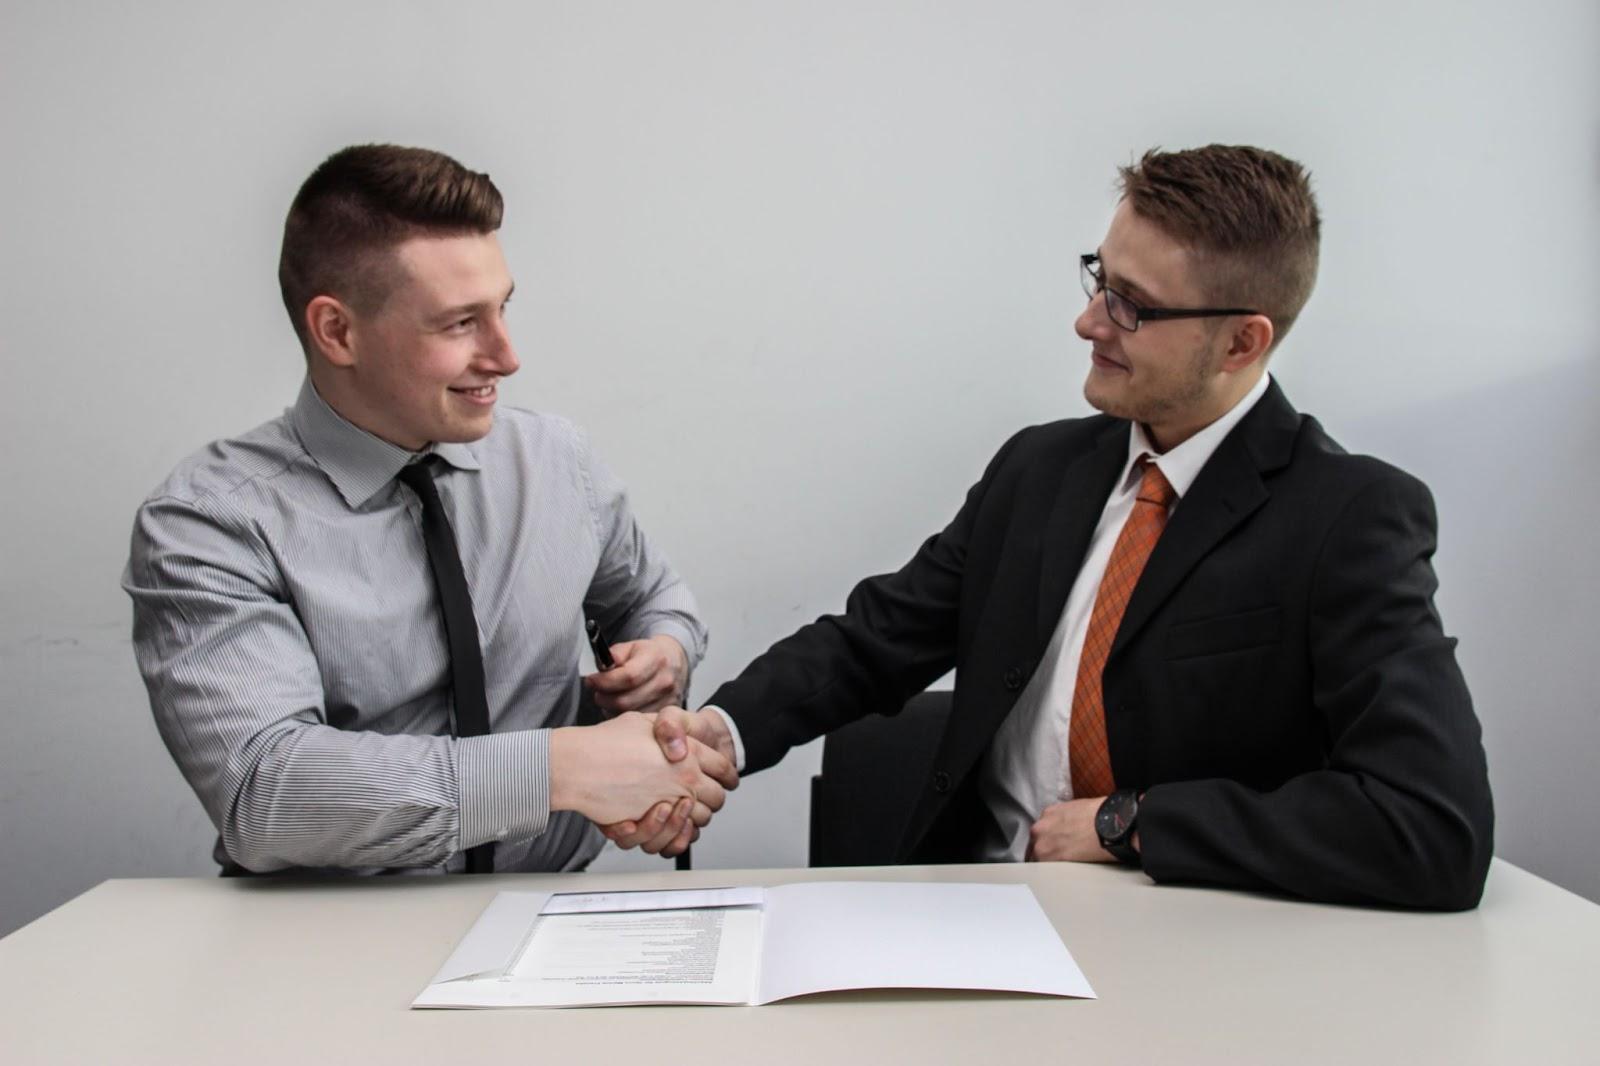 Using affiliates or partner programs